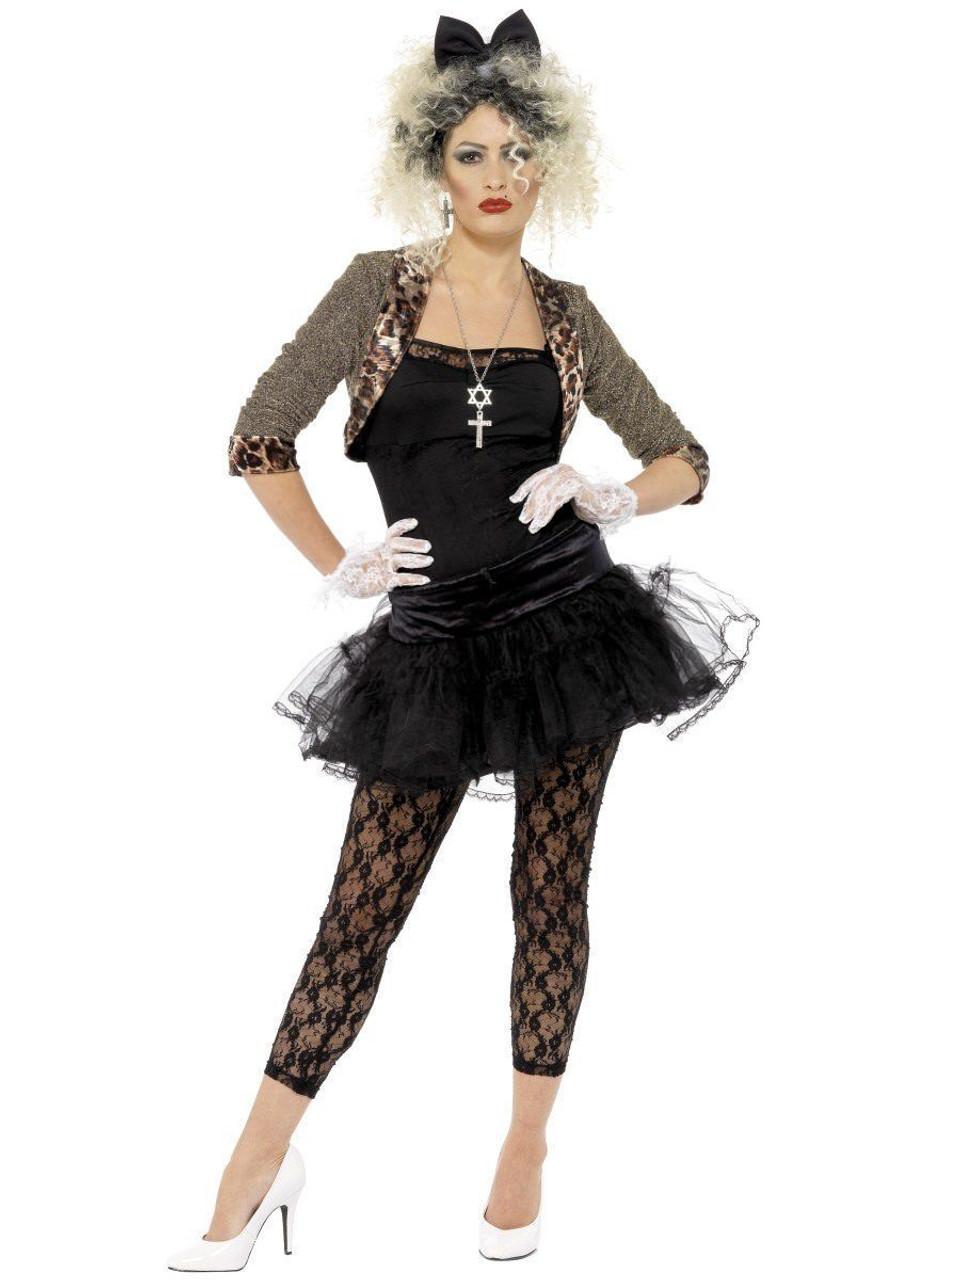 Underwraps Awesome 80/'s Tunic Rocker Dancer Diva Womens Halloween Costume 28738